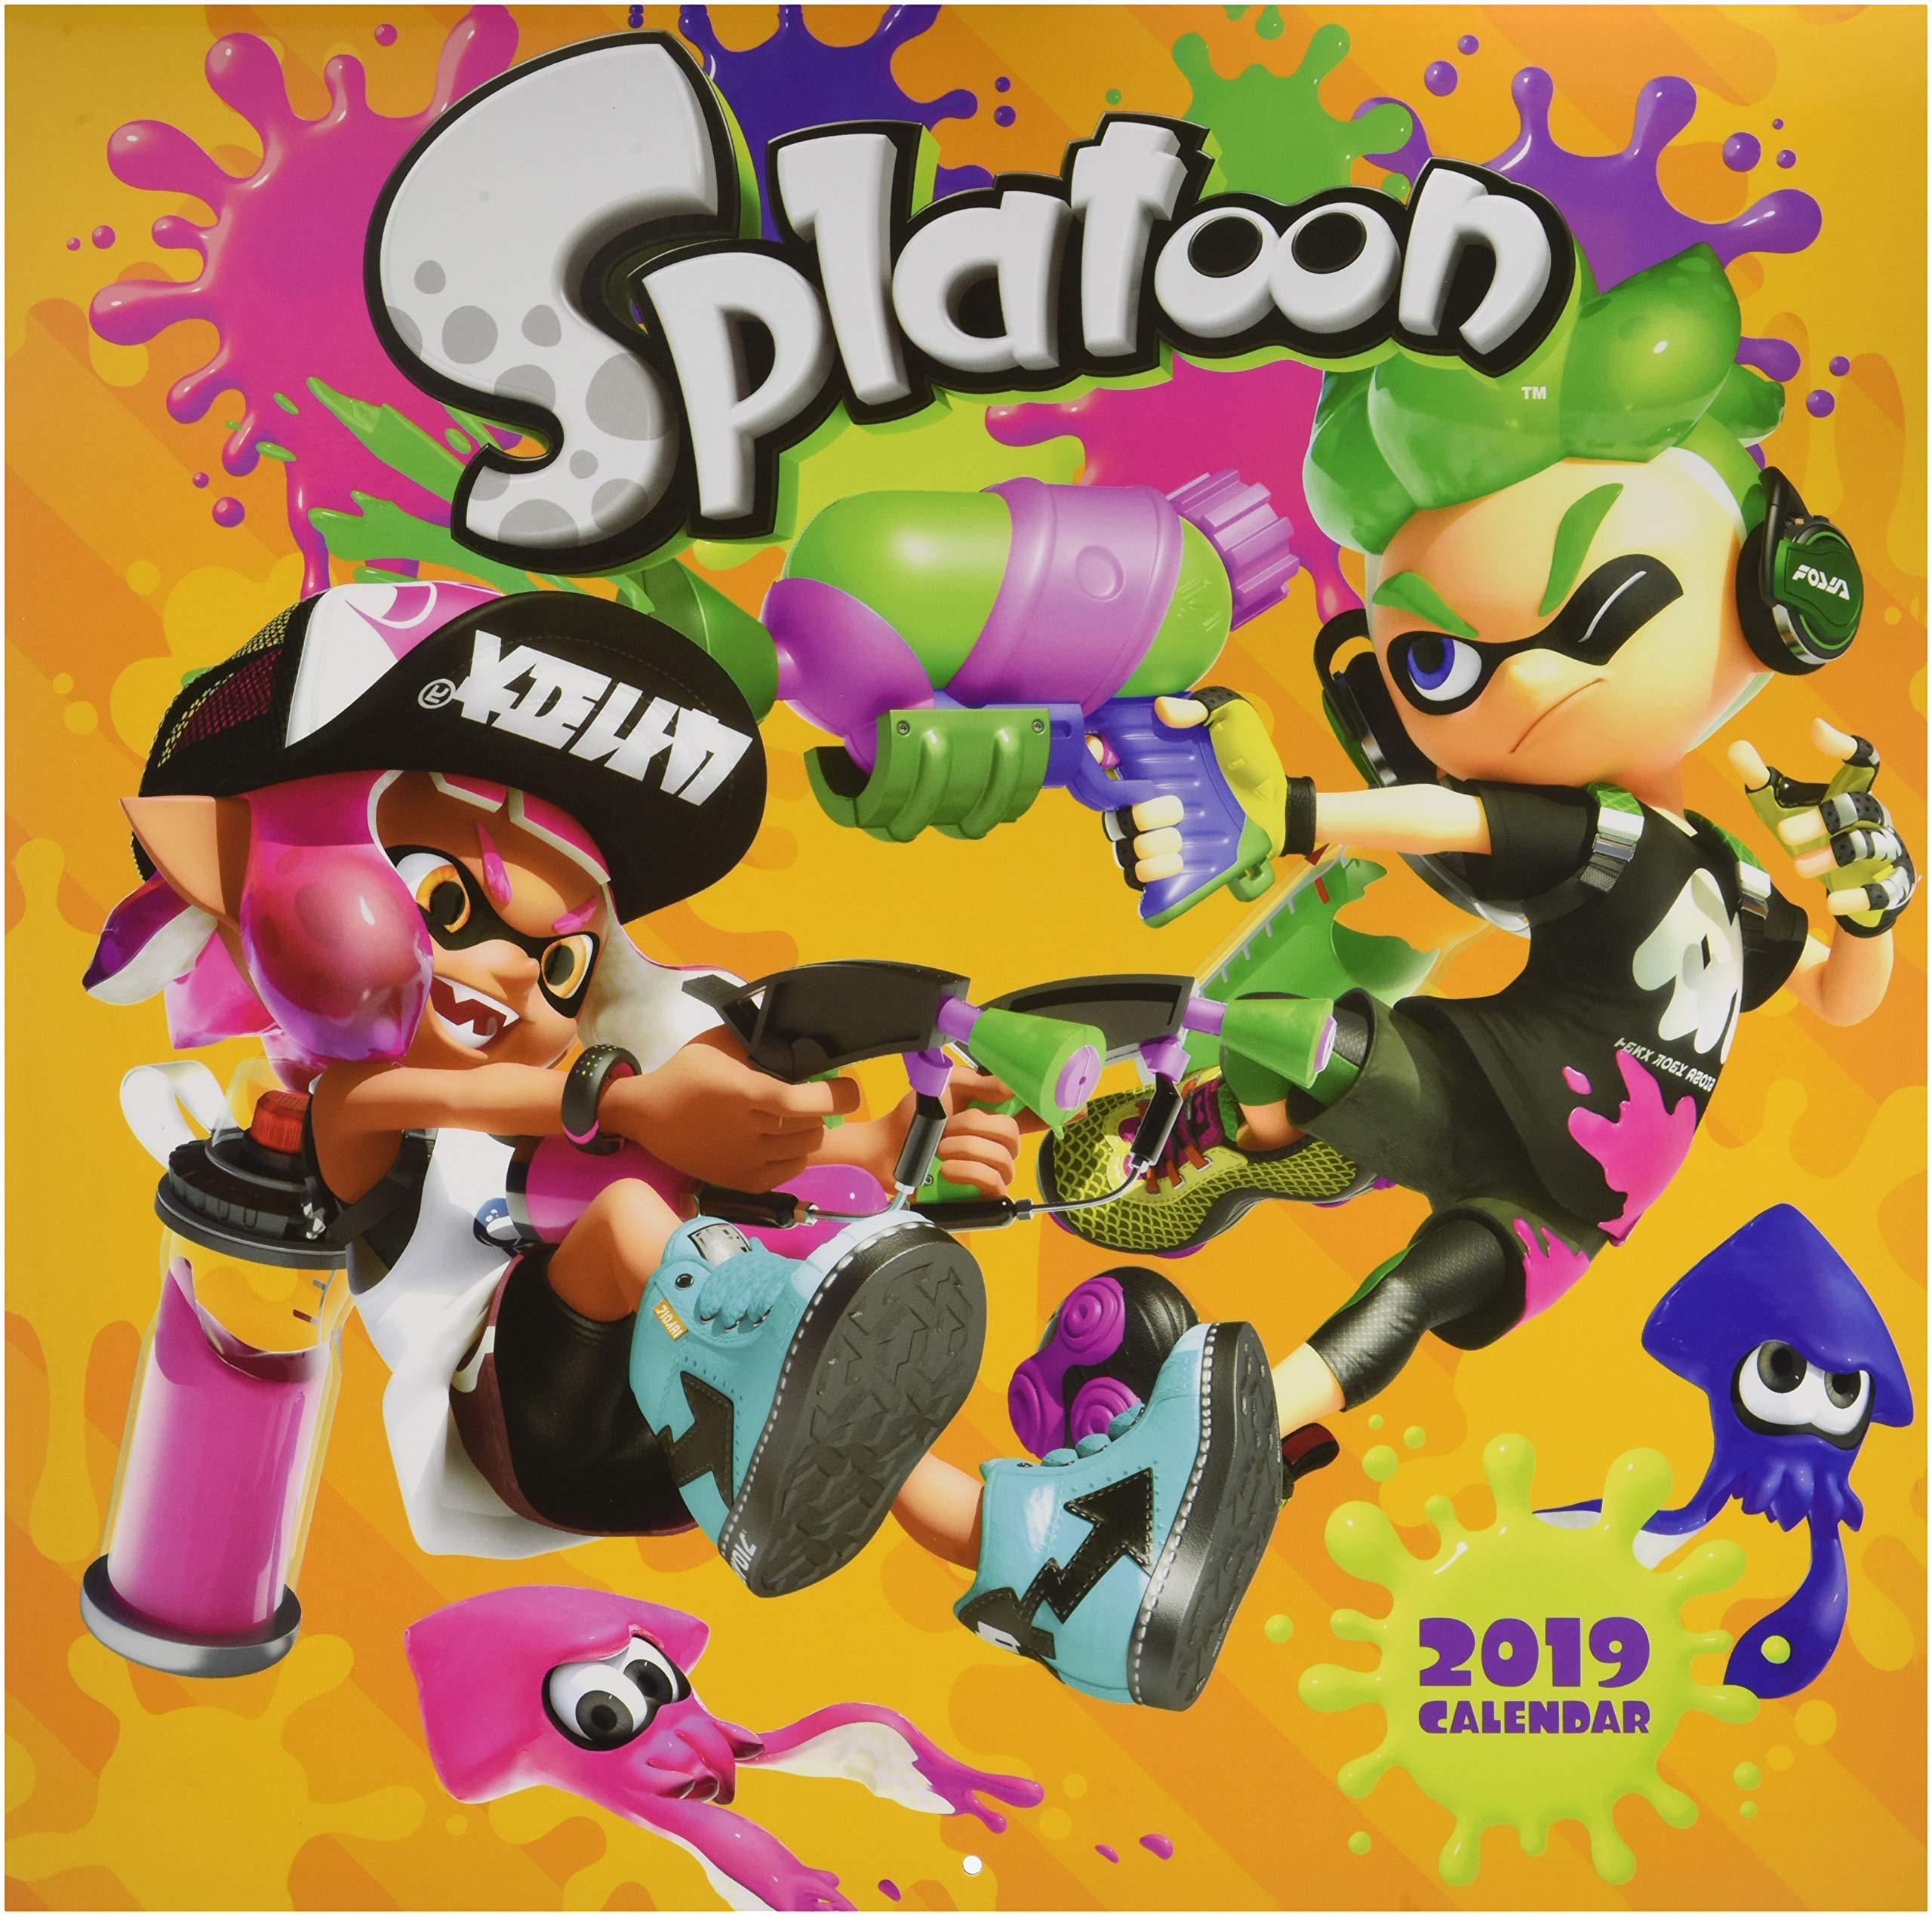 Splatoon 2019 Wall Calendar: Nintendo: 9781419731013: Amazon ...